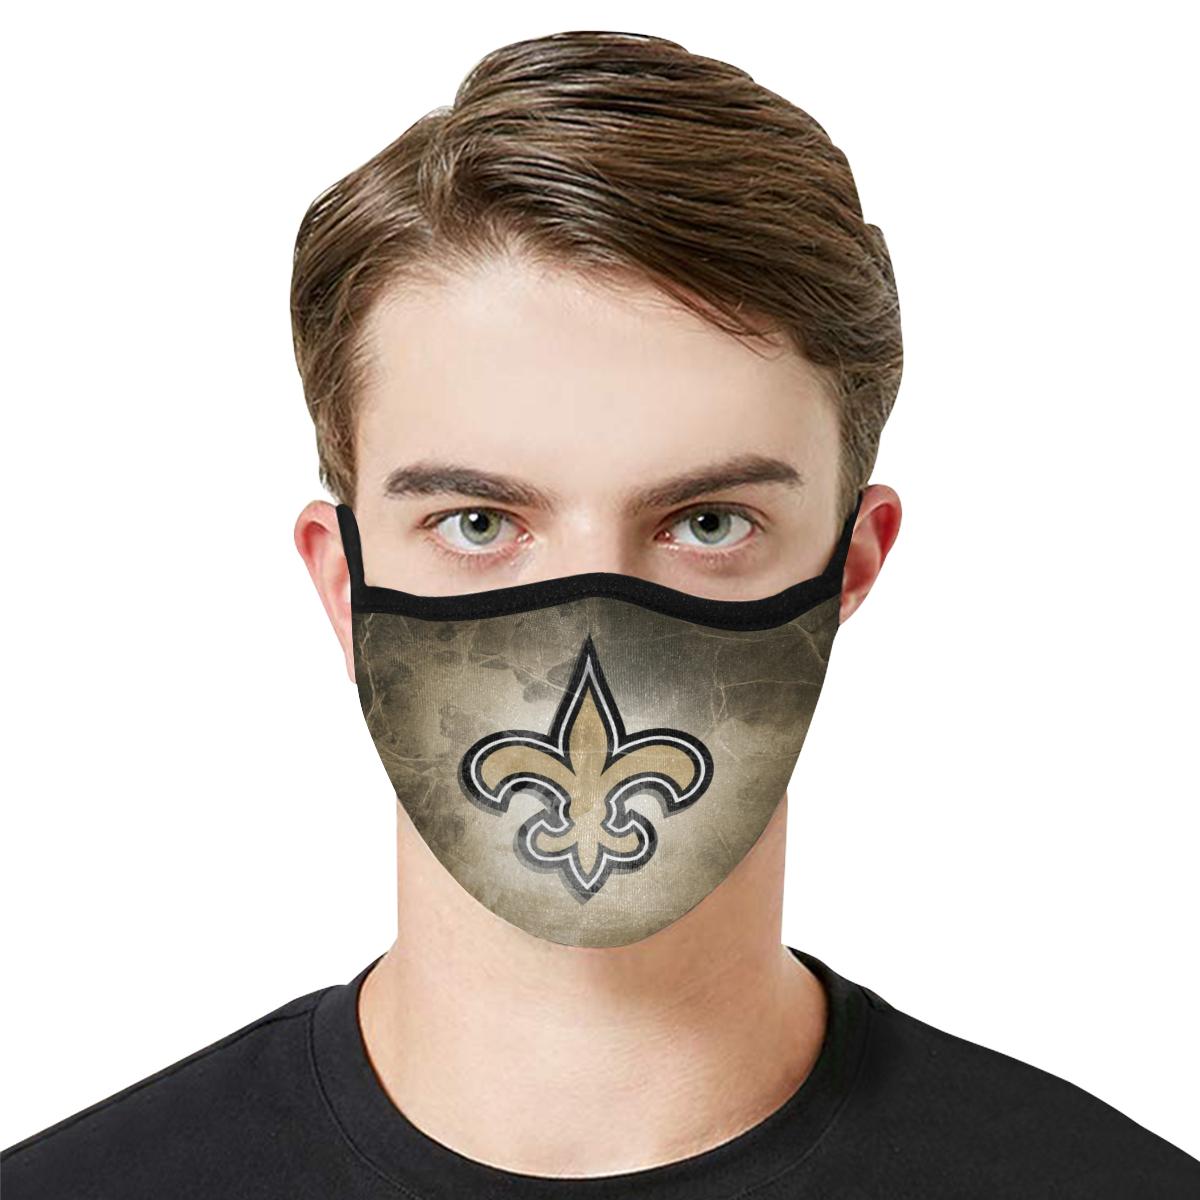 National football league new orleans saints cotton face mask 1